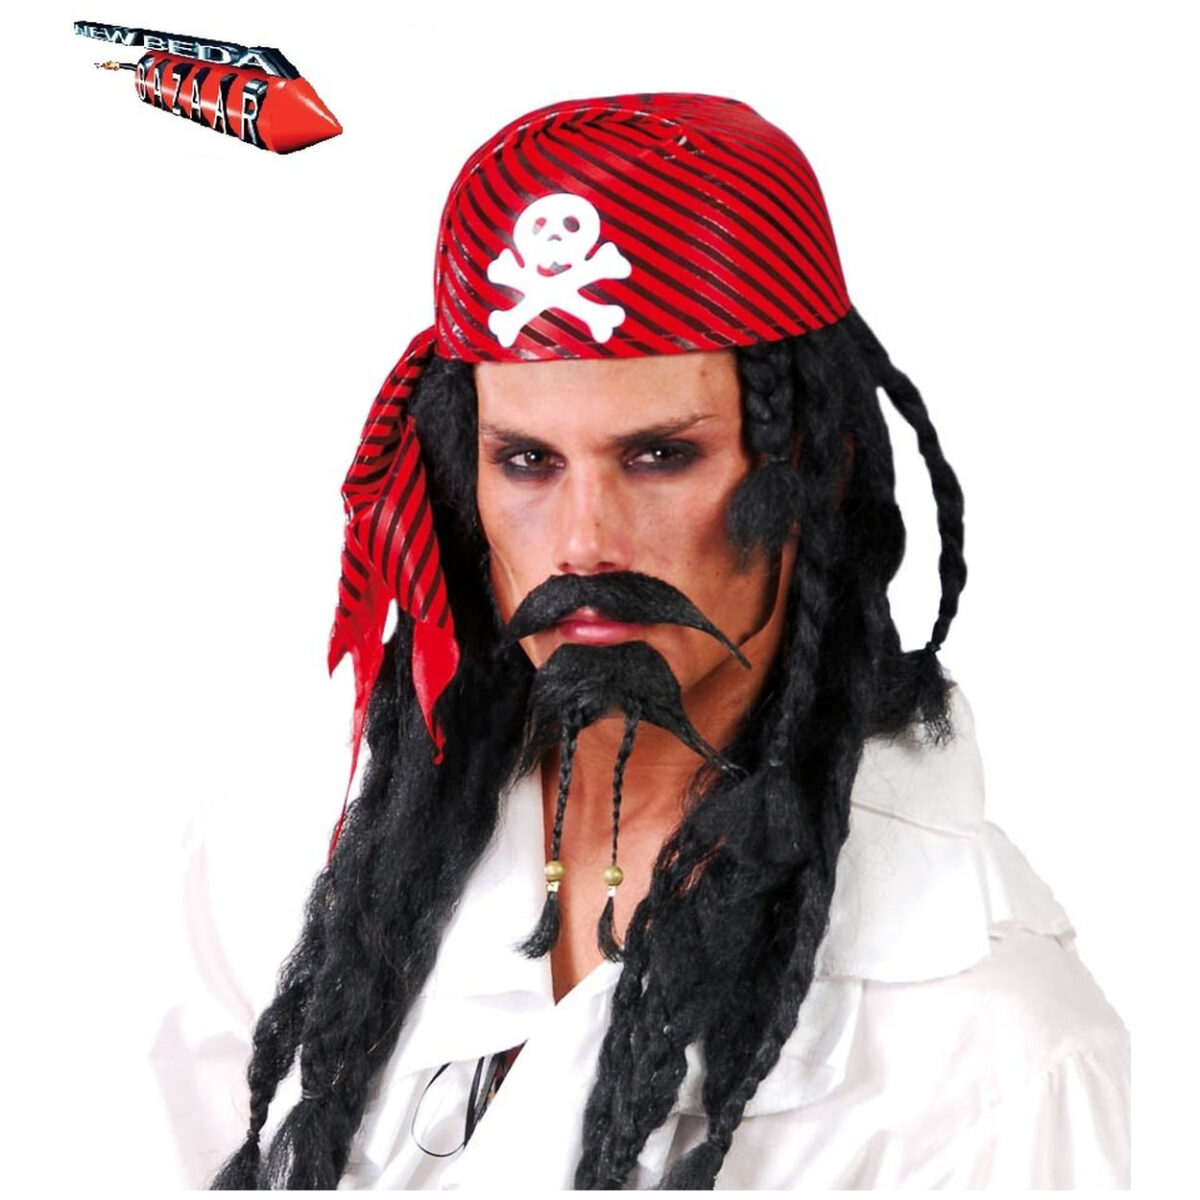 Bandana rigida pirata